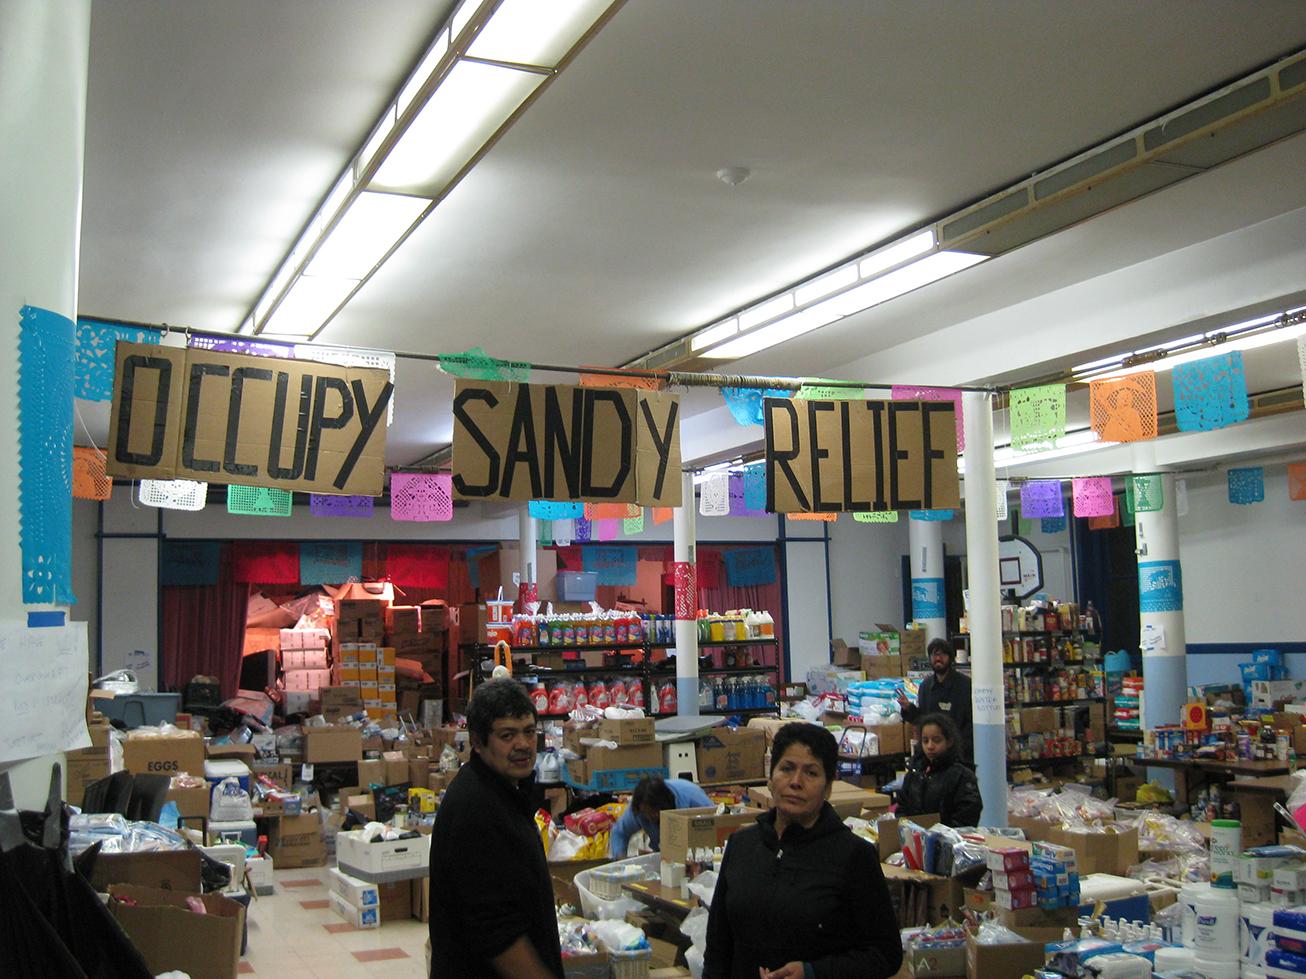 pSt.-Jacobi-Church-Occupy-Sandy-distribution-center-Brooklyn.-Flickroccupy617p